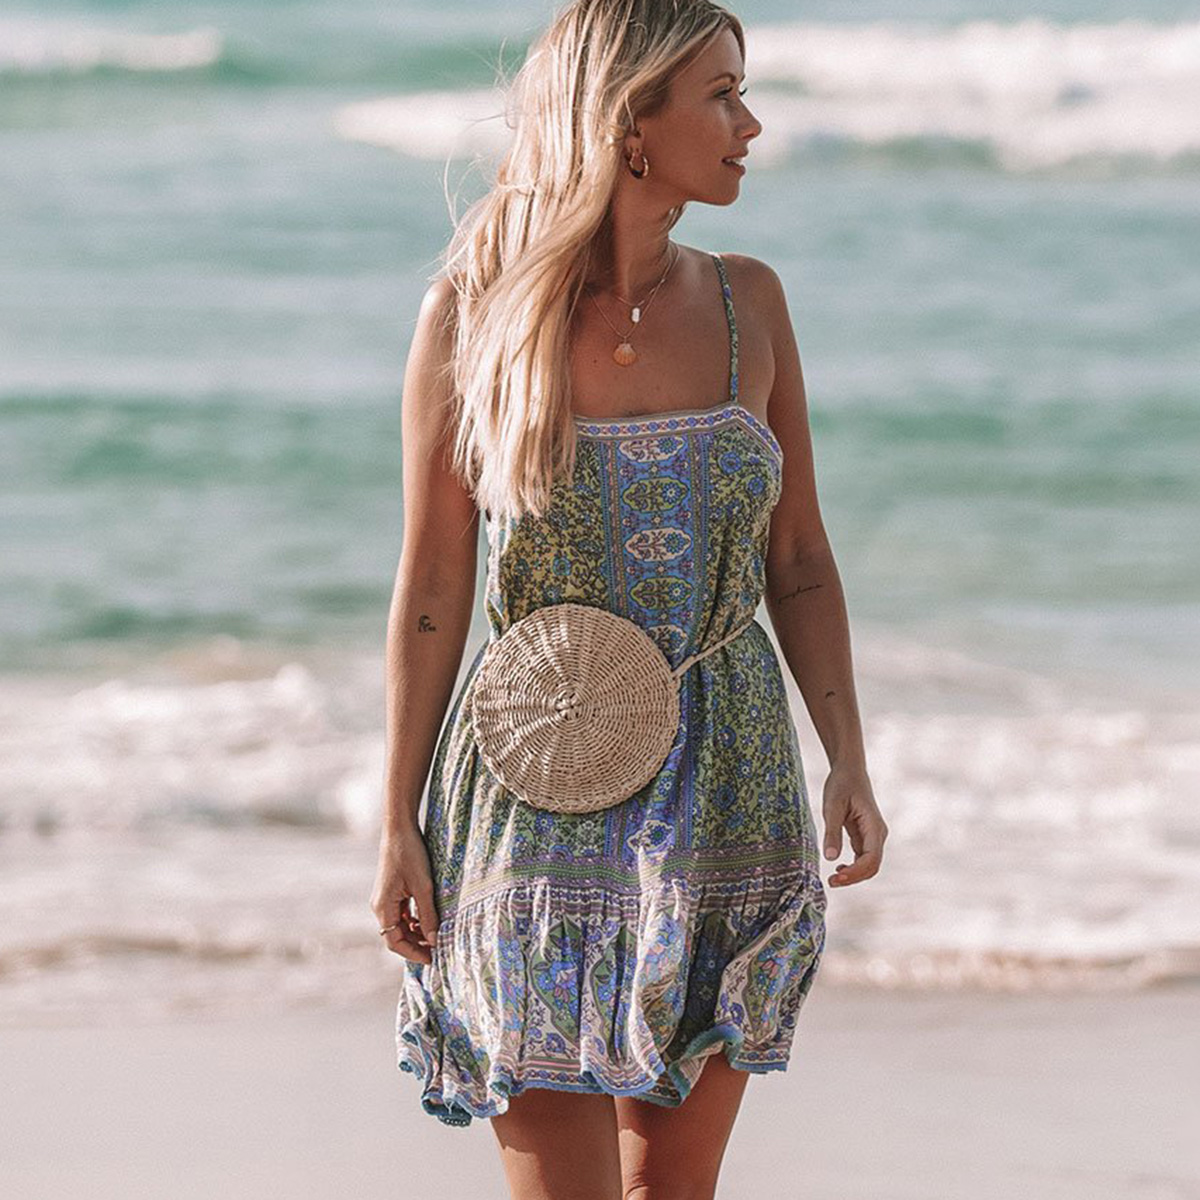 12025ab0754f Bohemian Beach Dress Sexy Low Back Strappy Mini Dresses Vintage Floral Print  Women Dress 2019 Summer Dresses Short Vestidos